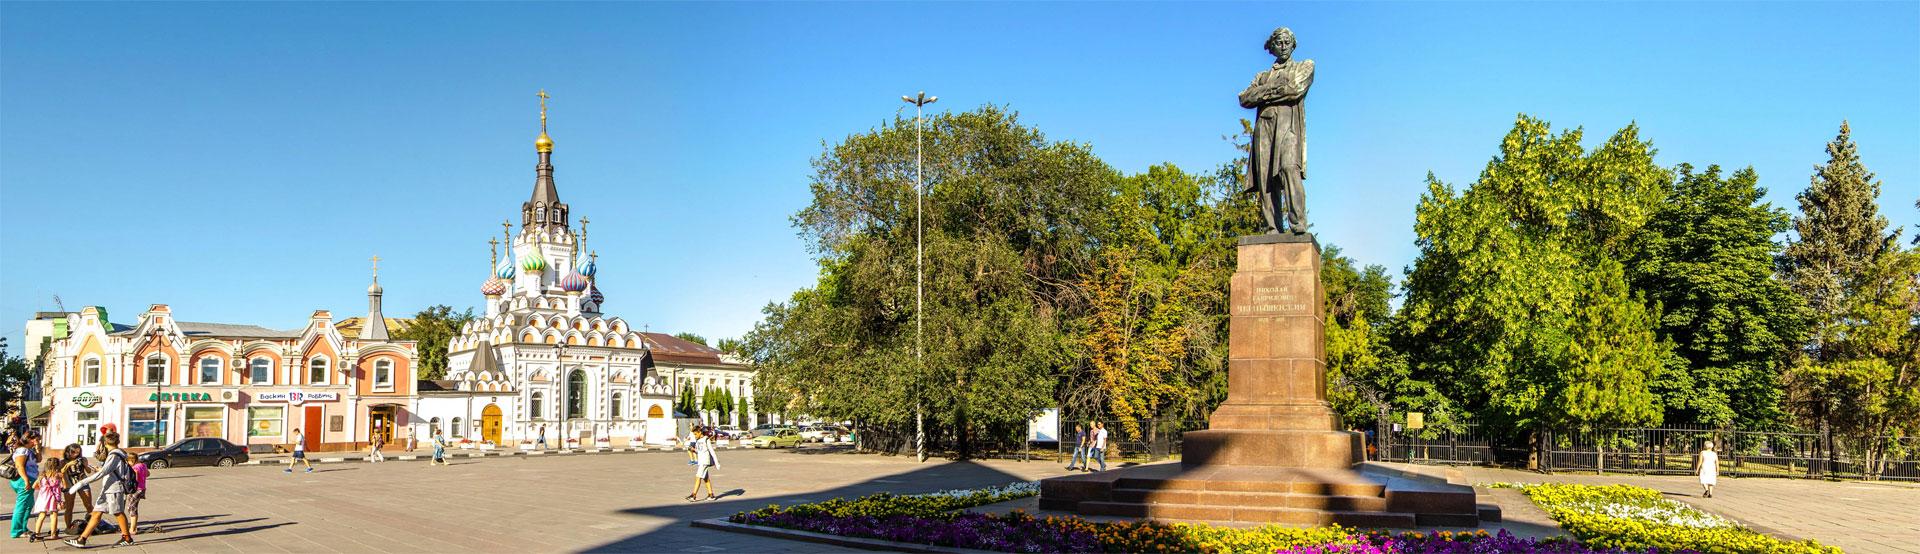 Центральная улица на карте Саратов (проложить маршрут, панорамы)